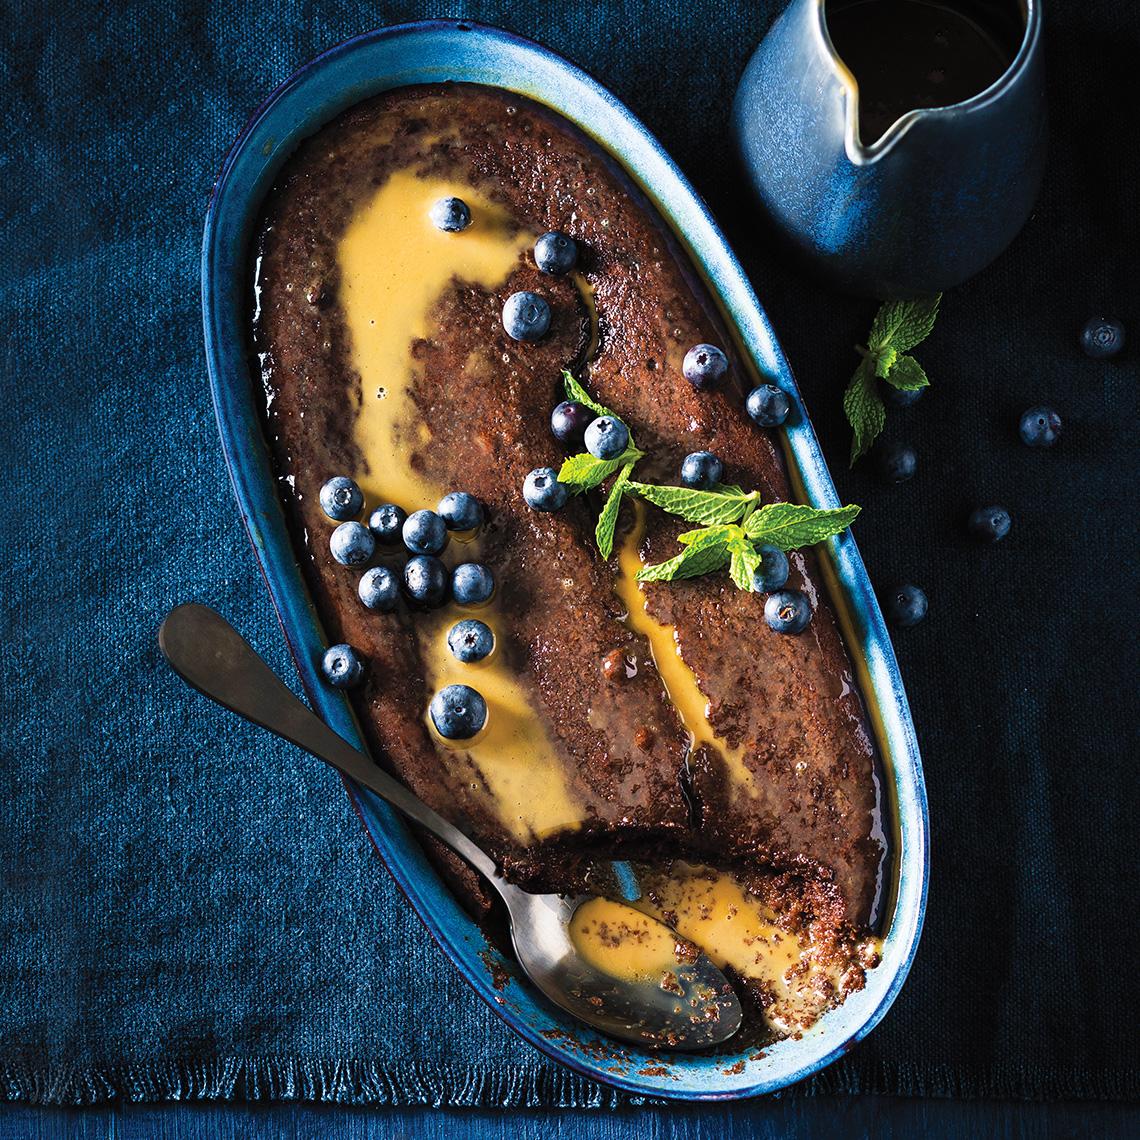 Chocolate and caramel malva pudding